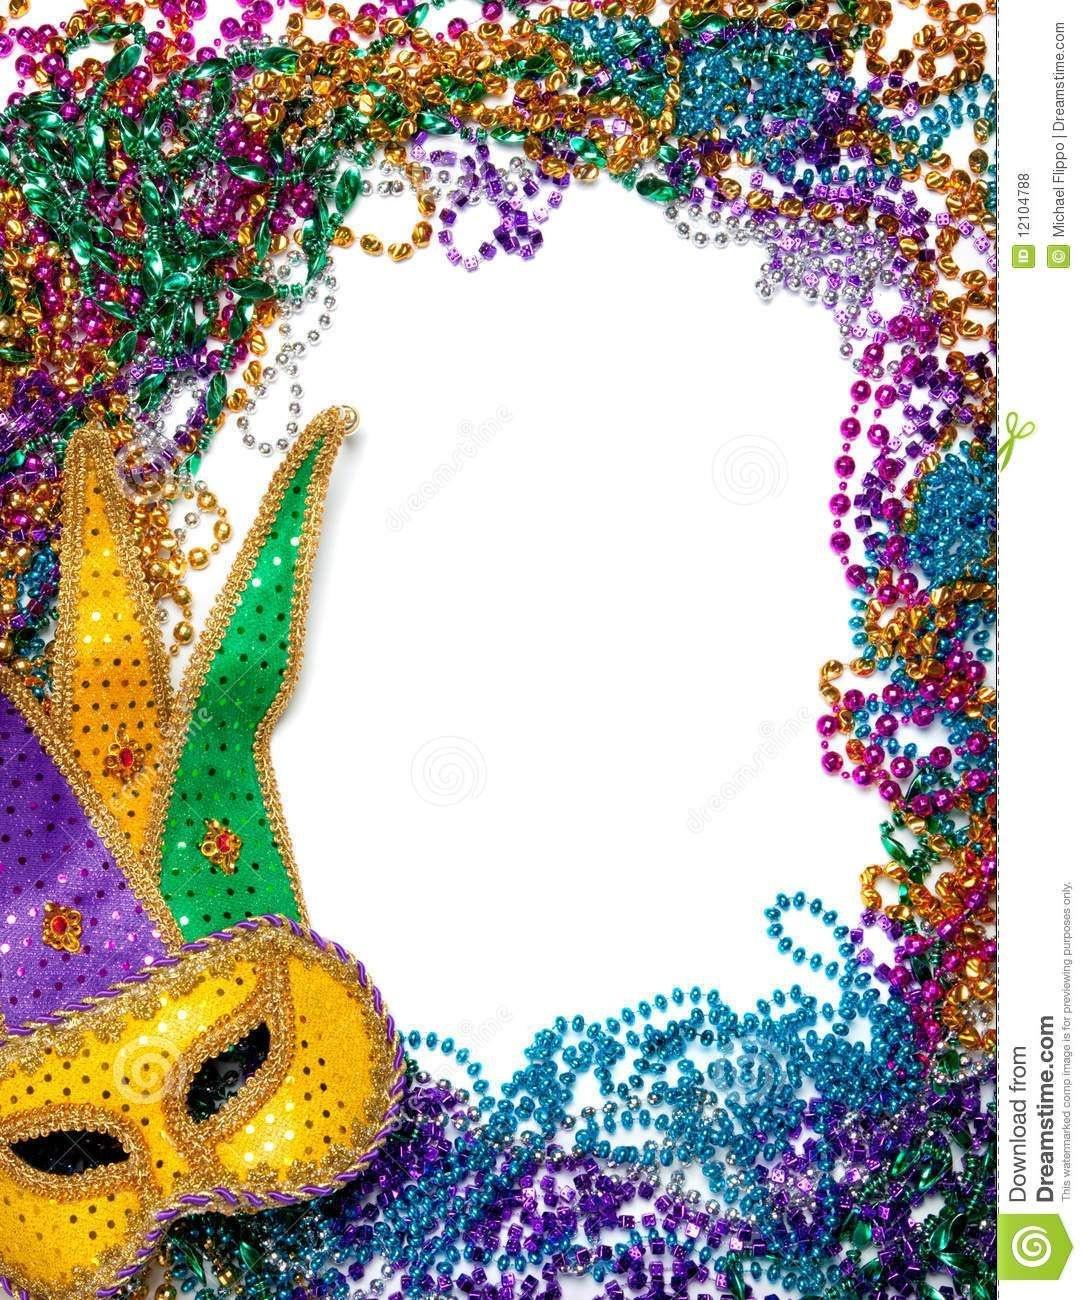 Free Printable Mardi Gras Borders. Royalty Free Stock Photos Border - Free Printable Mardi Gras Invitations